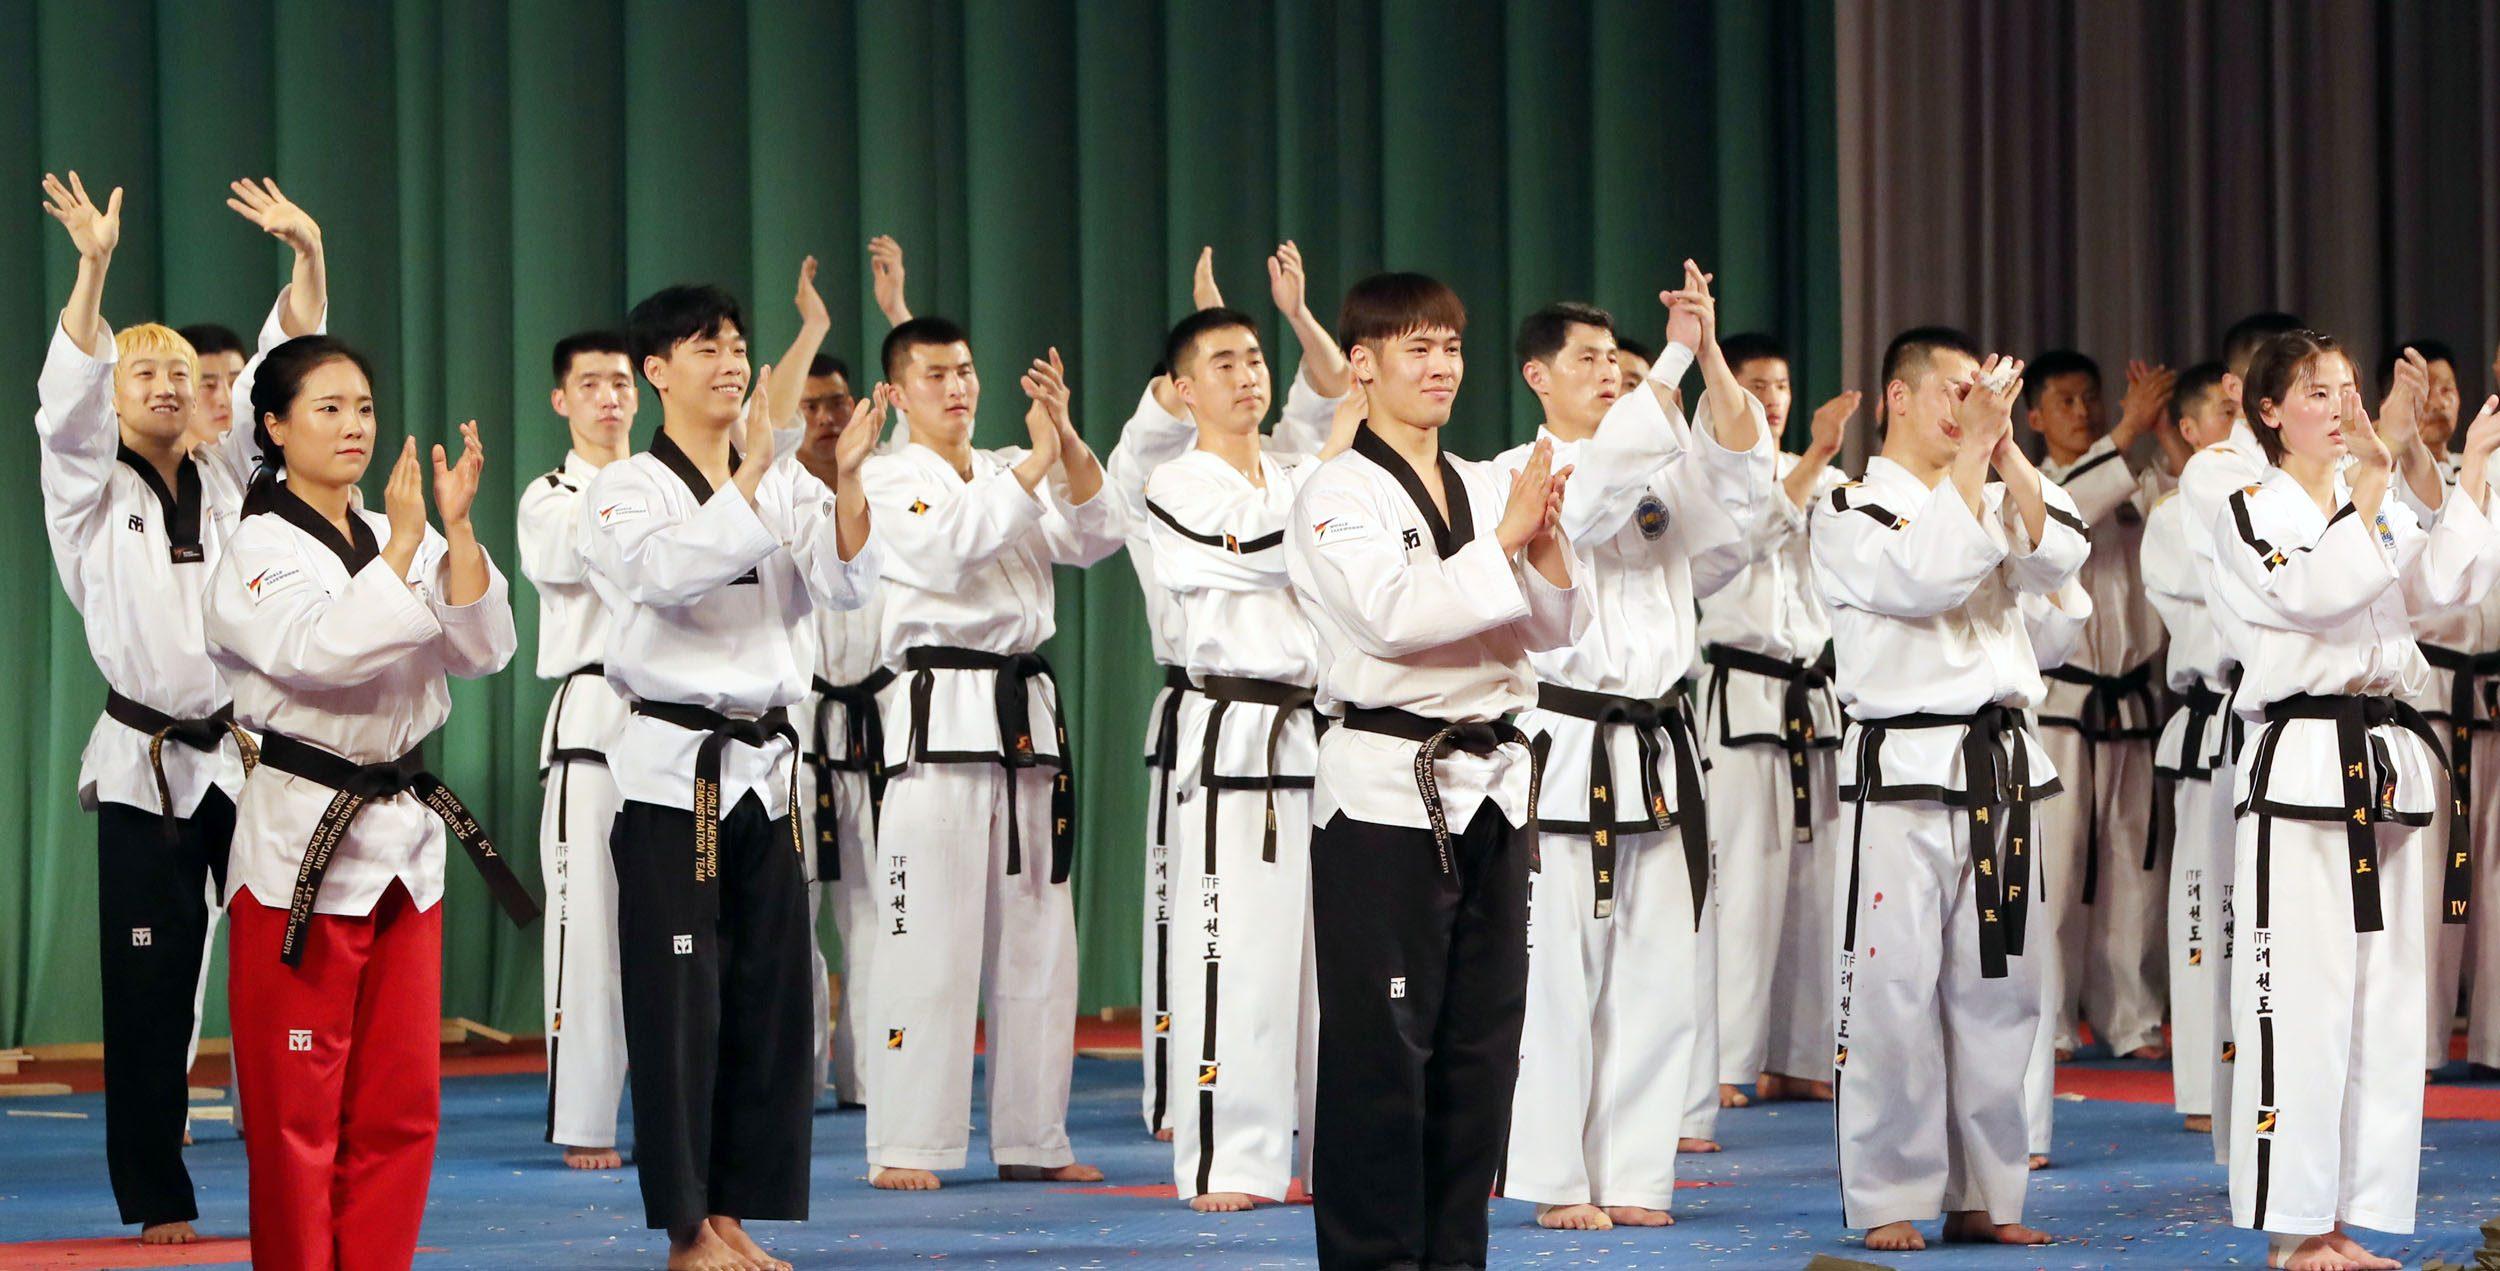 Joint taekwondo event of South and North Korea